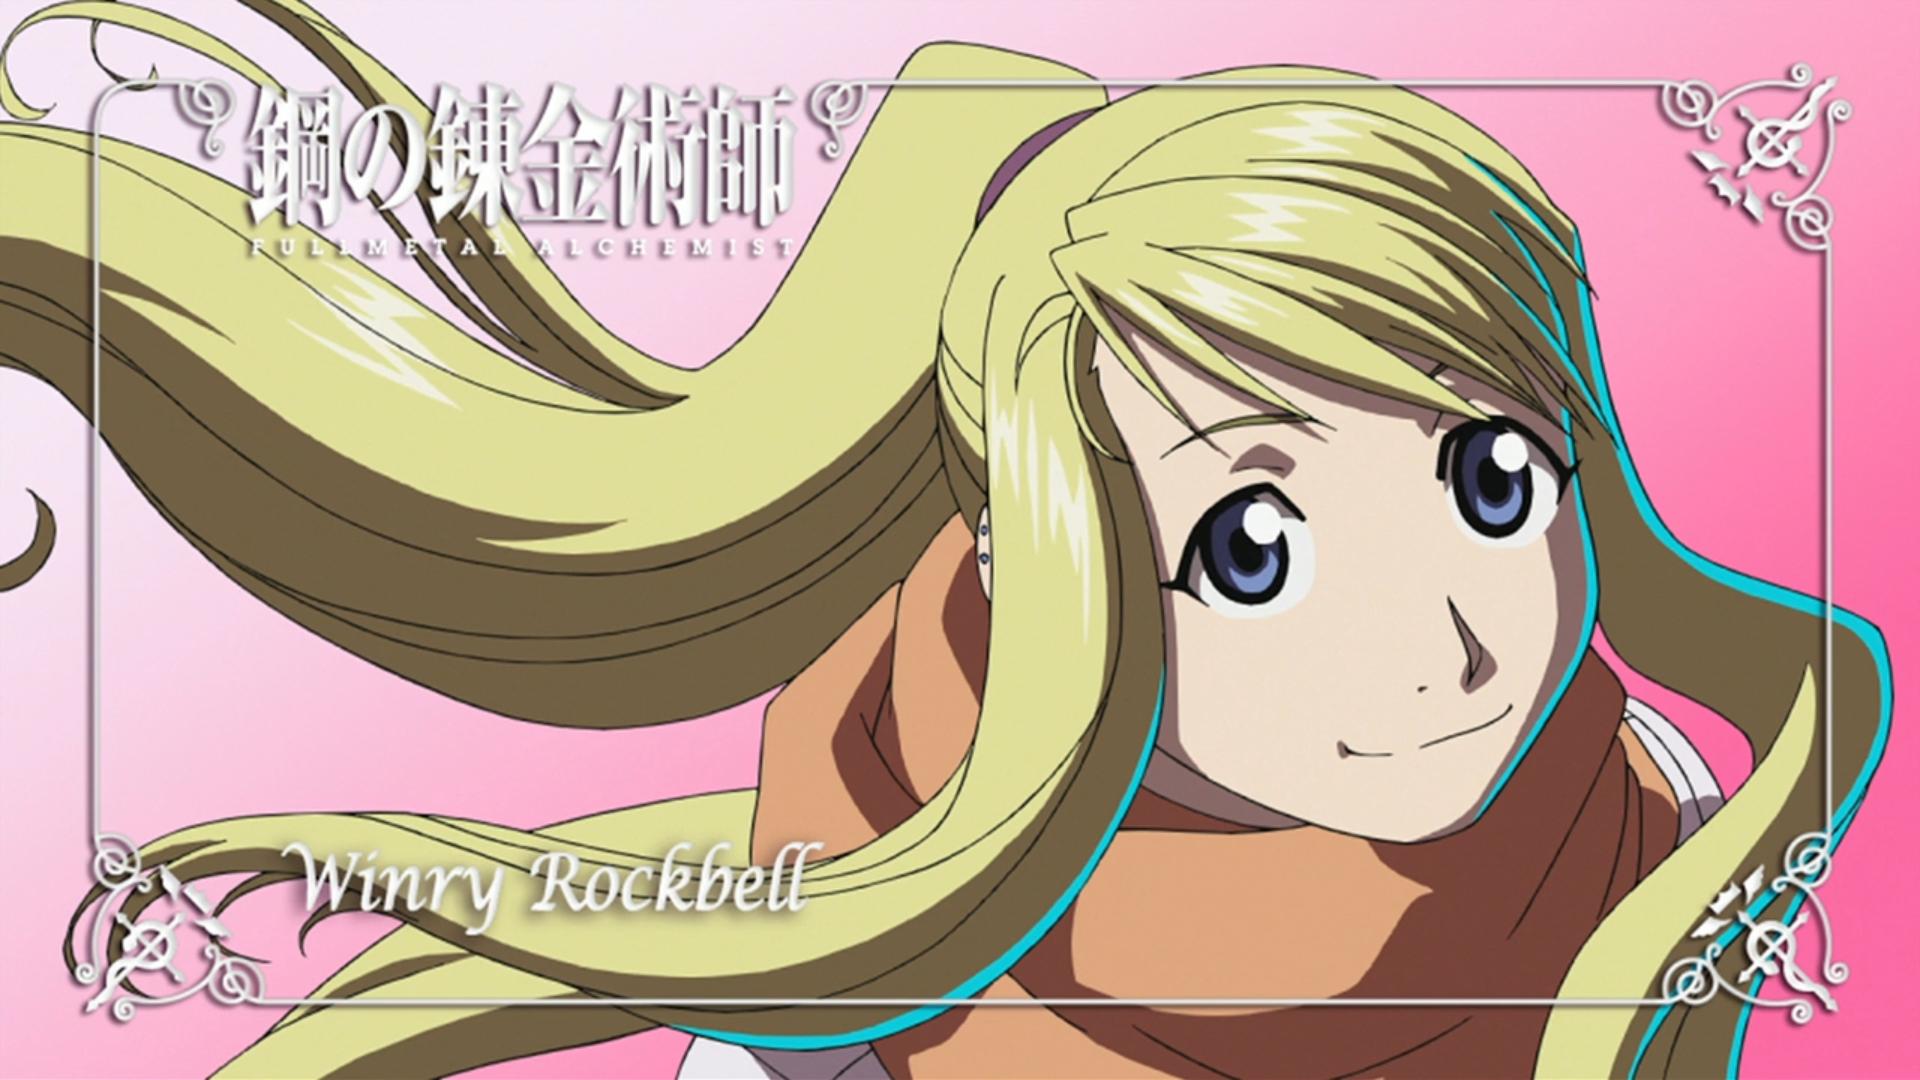 Fond d'écran : illustration, Anime, dessin animé, bouche, Fullmetal Alchemist Brotherhood ...